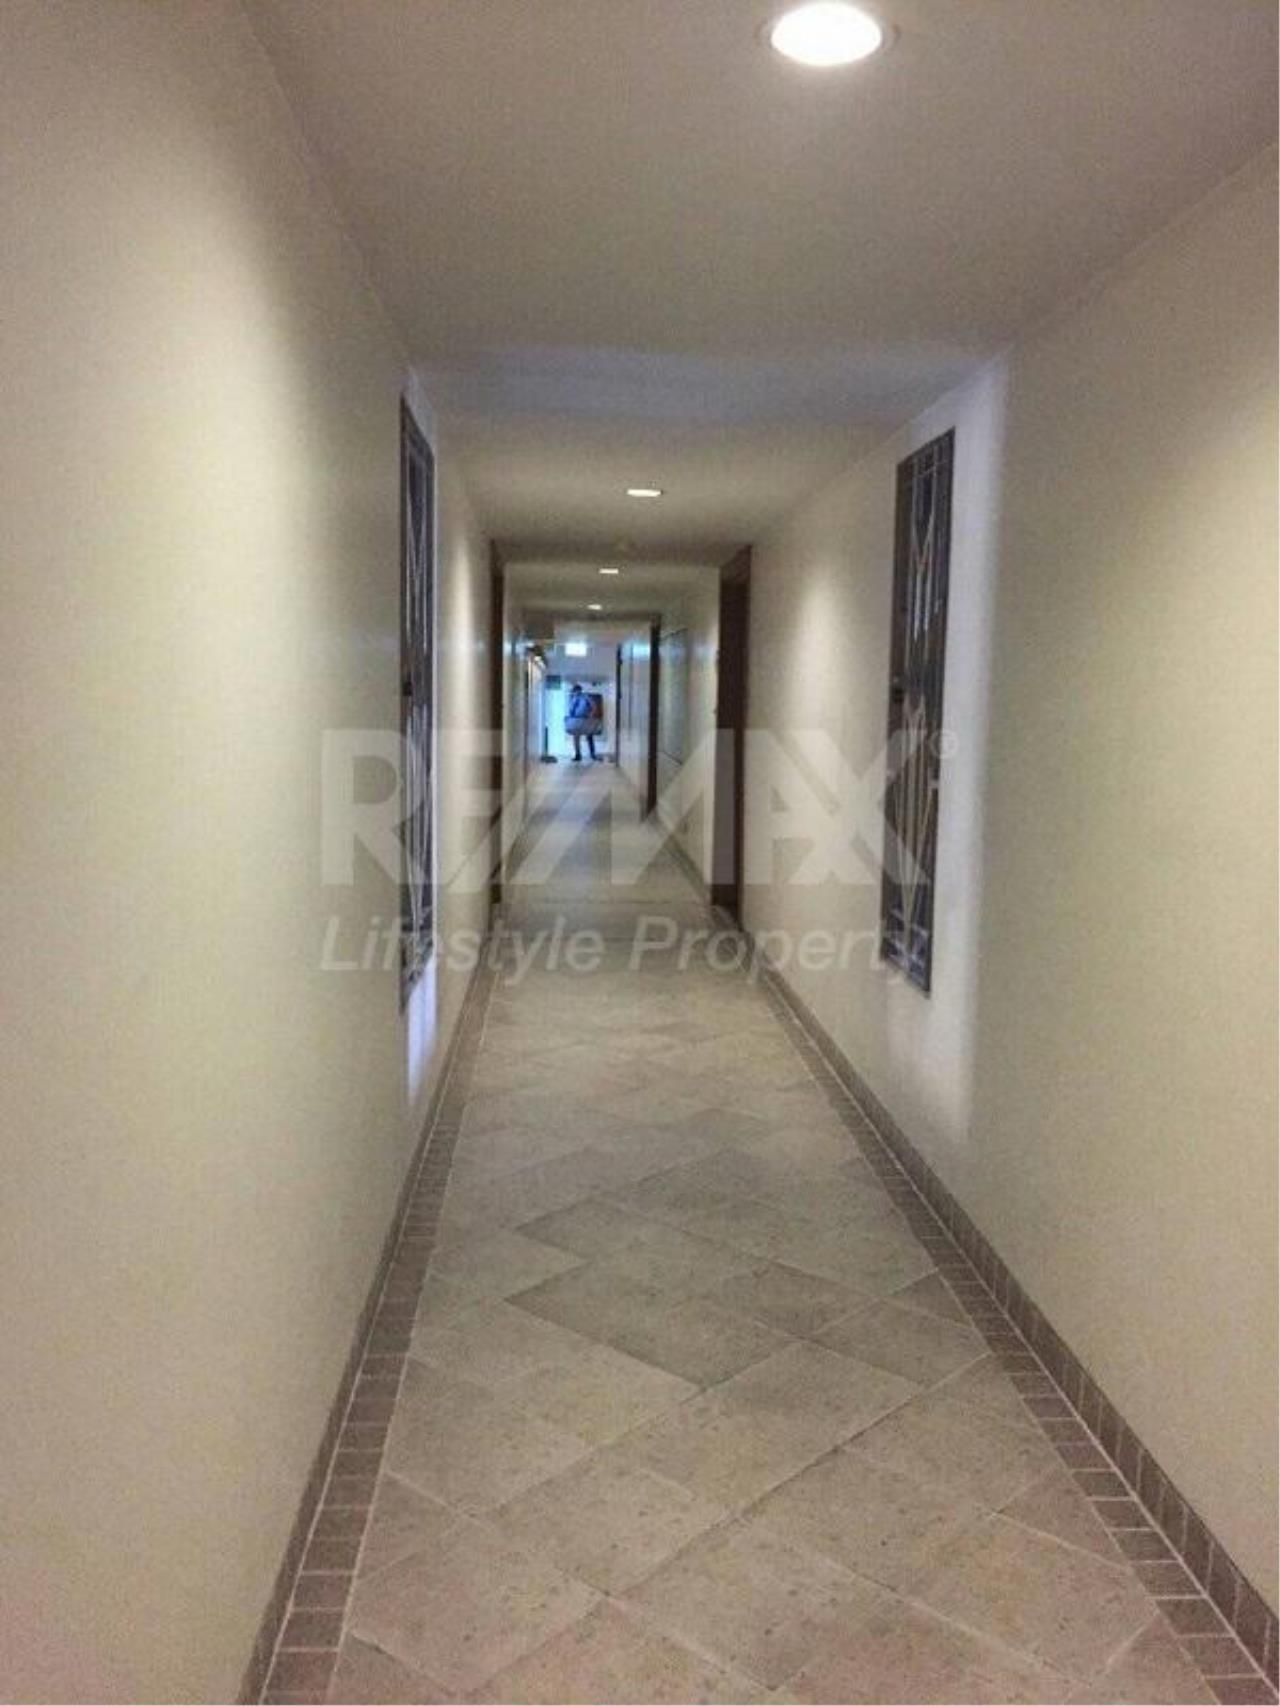 RE/MAX LifeStyle Property Agency's Baan Siri Ruedee 3